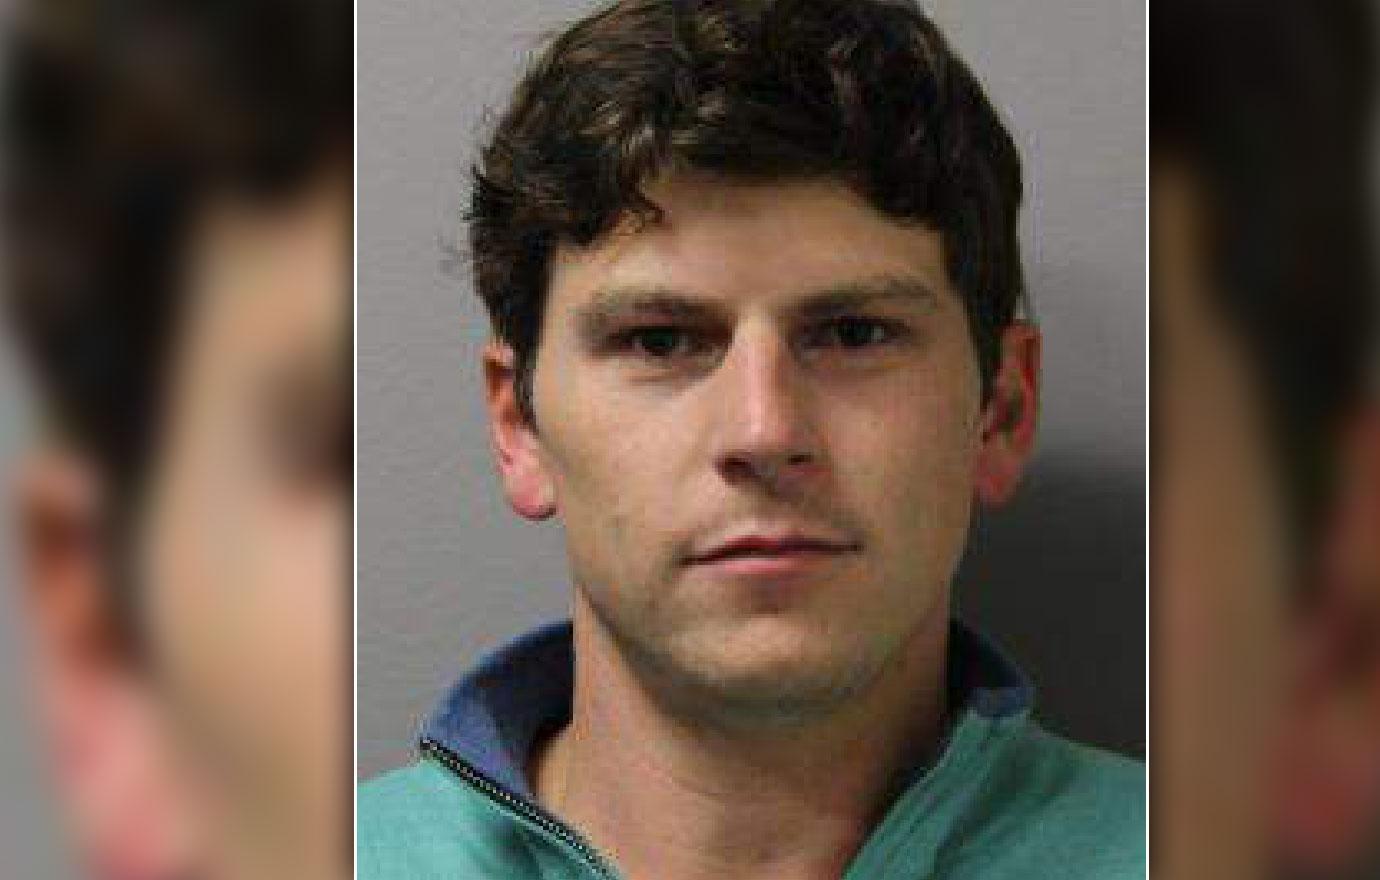 Fund Heir Cameron McDermott Cries Rape Sentence